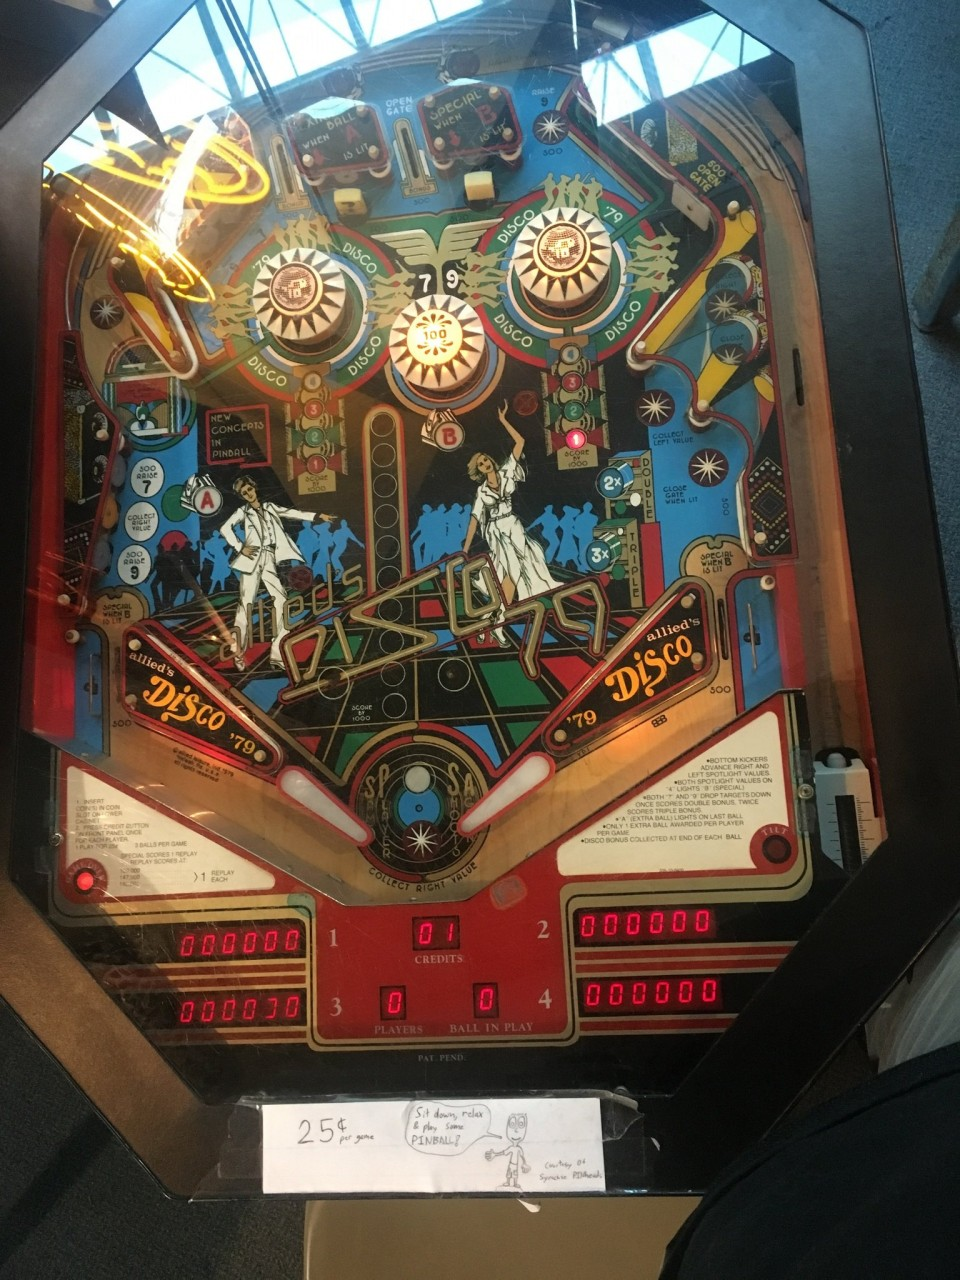 A high-school teacher fulfills his childhood dream of opening a pinball arcade | syracuse.com